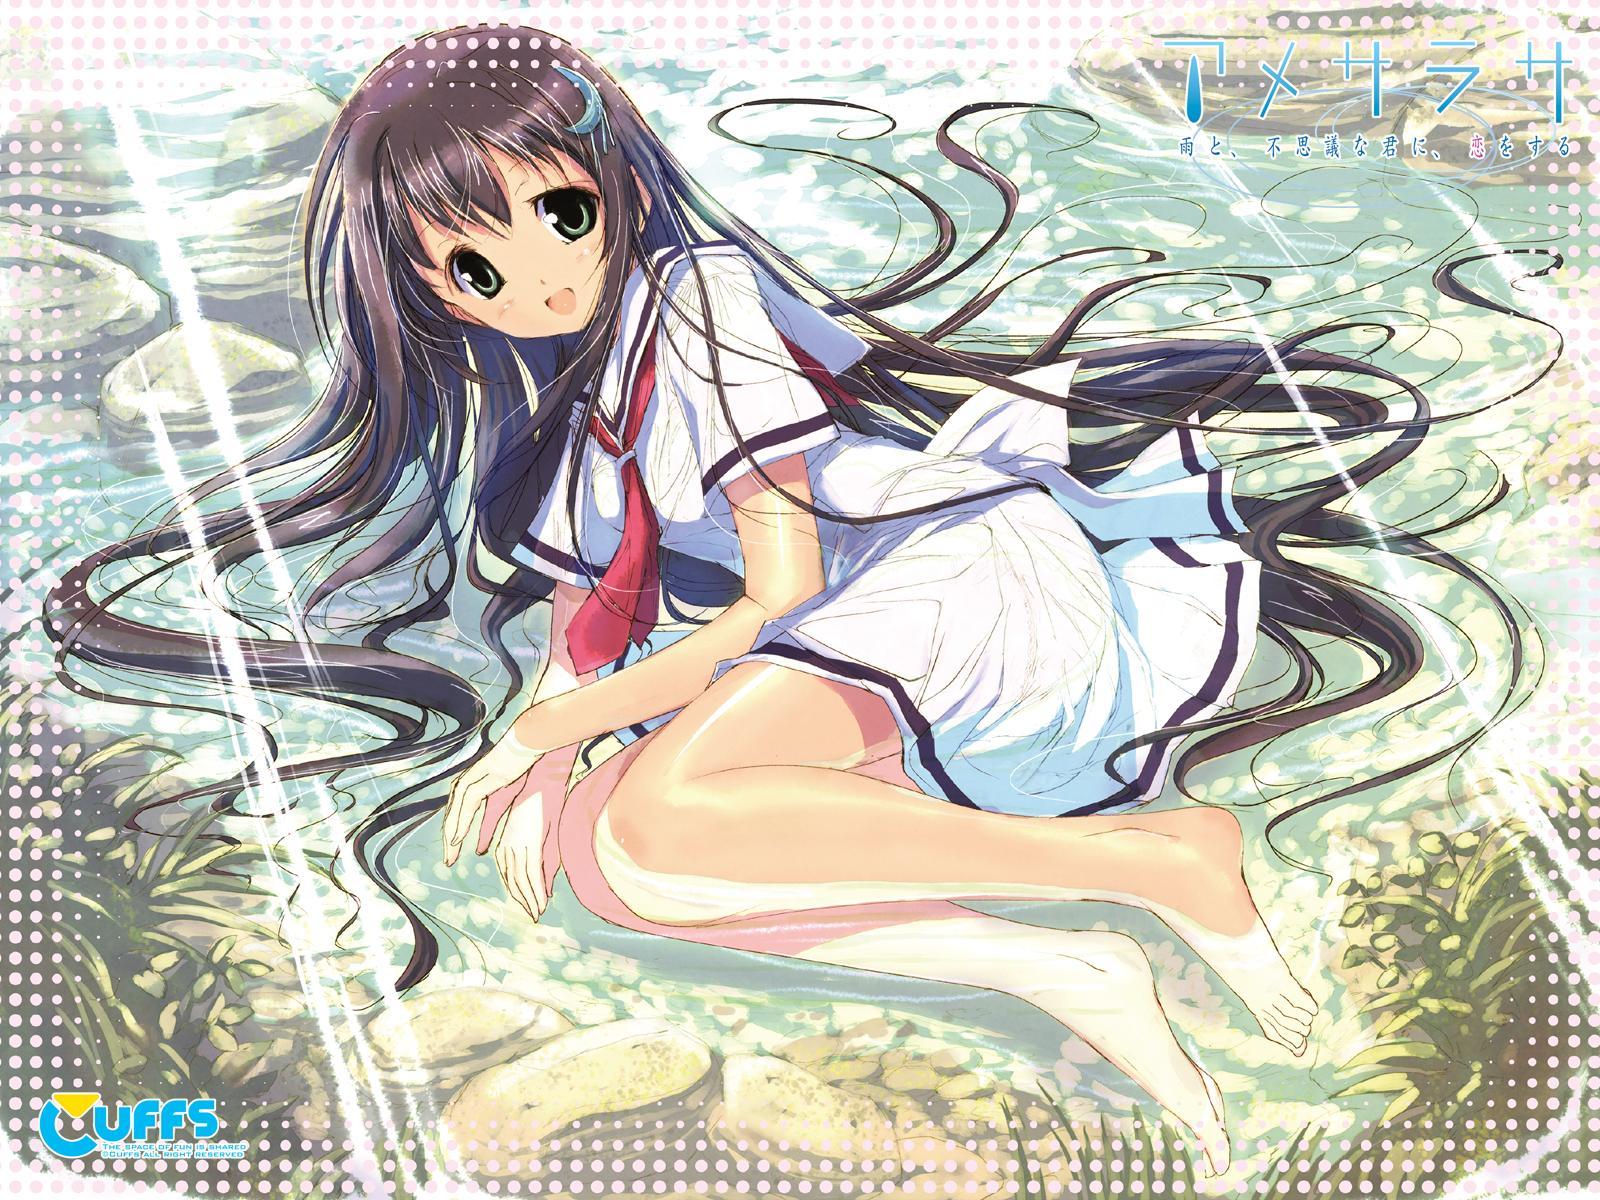 amesarasa barefoot brown_hair chiyokawa_rin cuffs_(studio) green_eyes long_hair school_uniform water